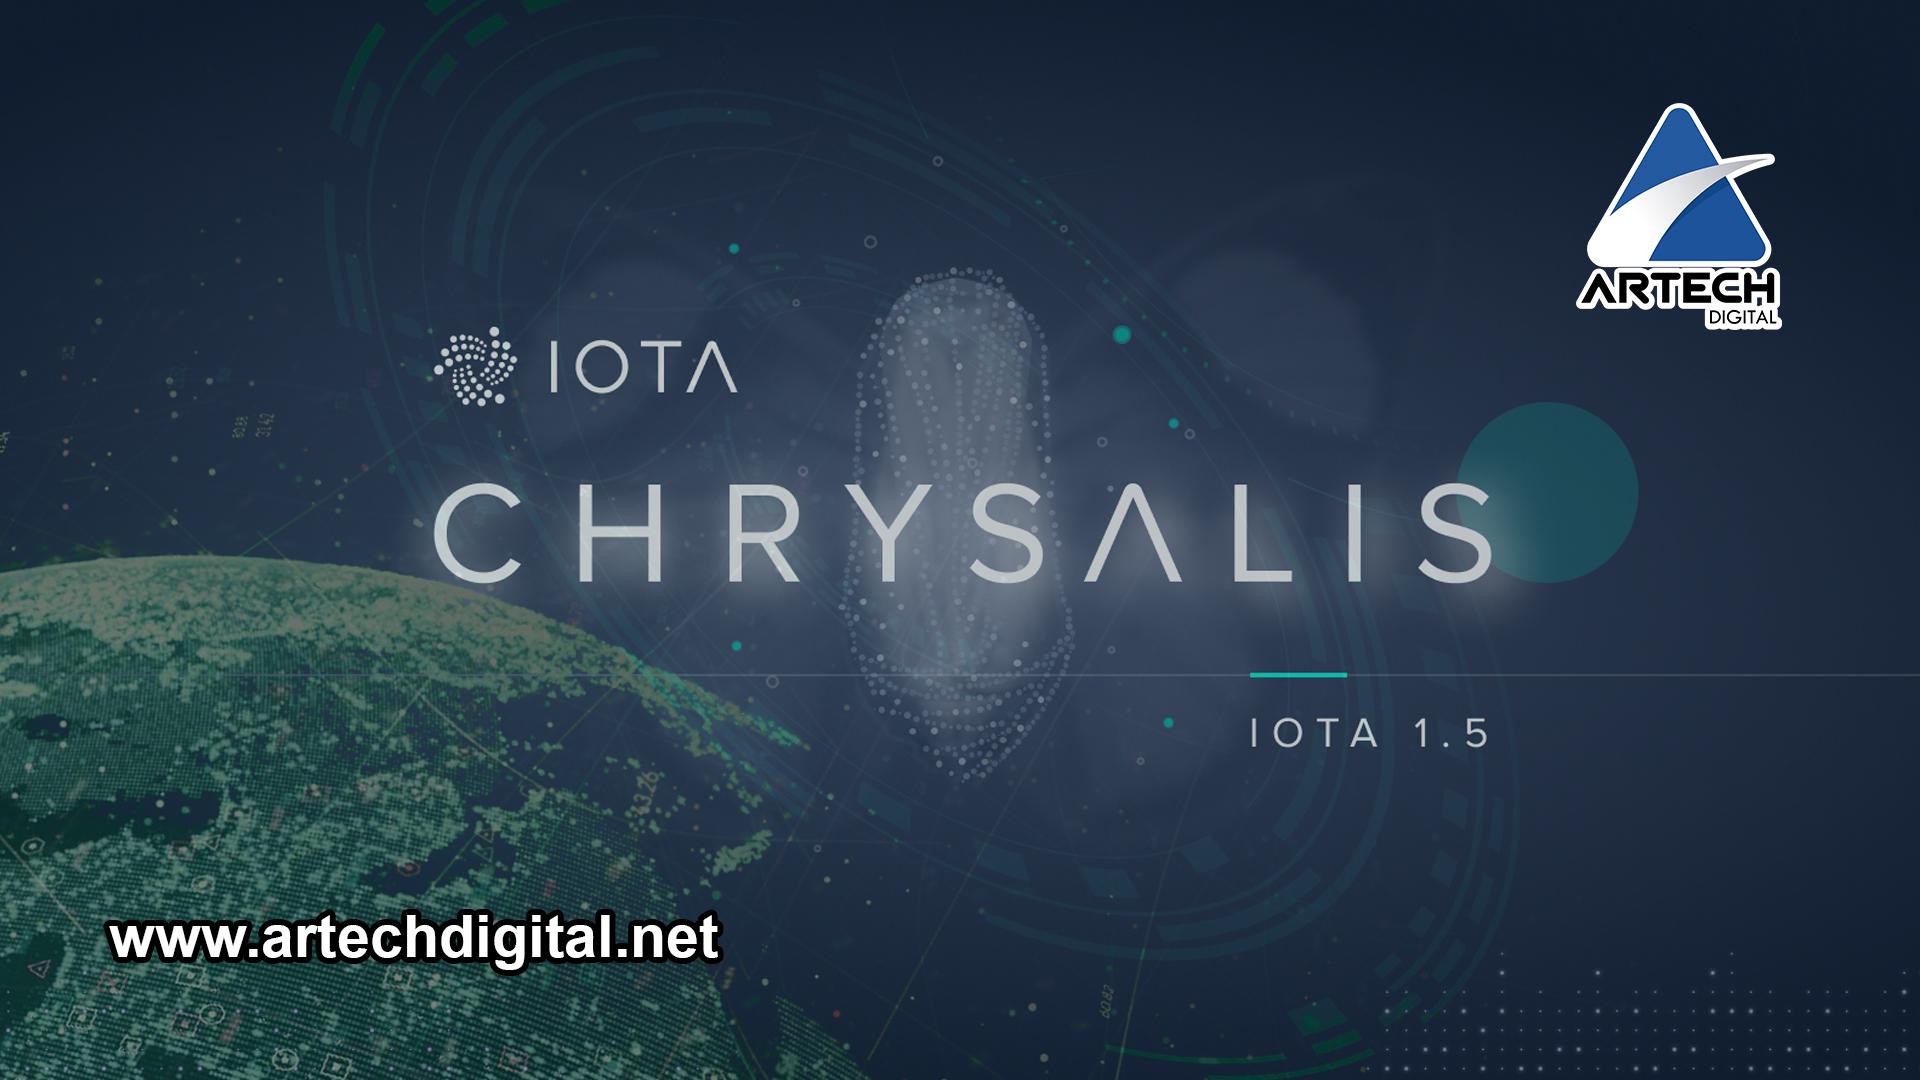 Fase 2 de Chrysalis - Artech Digital